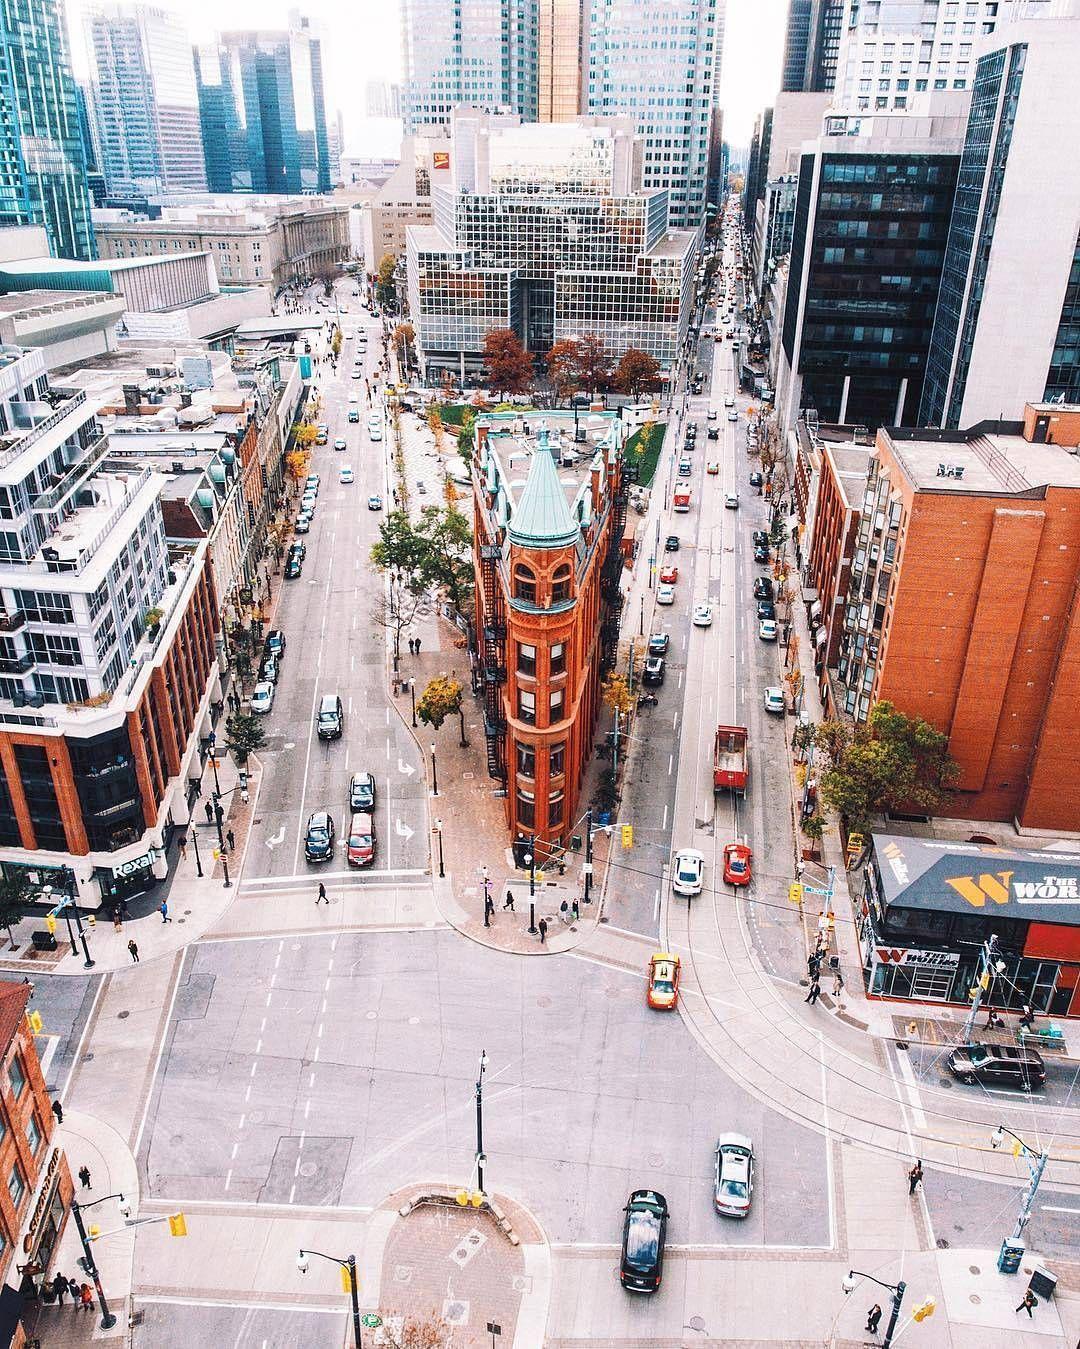 Streets Of Toronto Streetsoftoronto Instagram Photos And Videos Toronto Vacation Canada Travel Toronto City